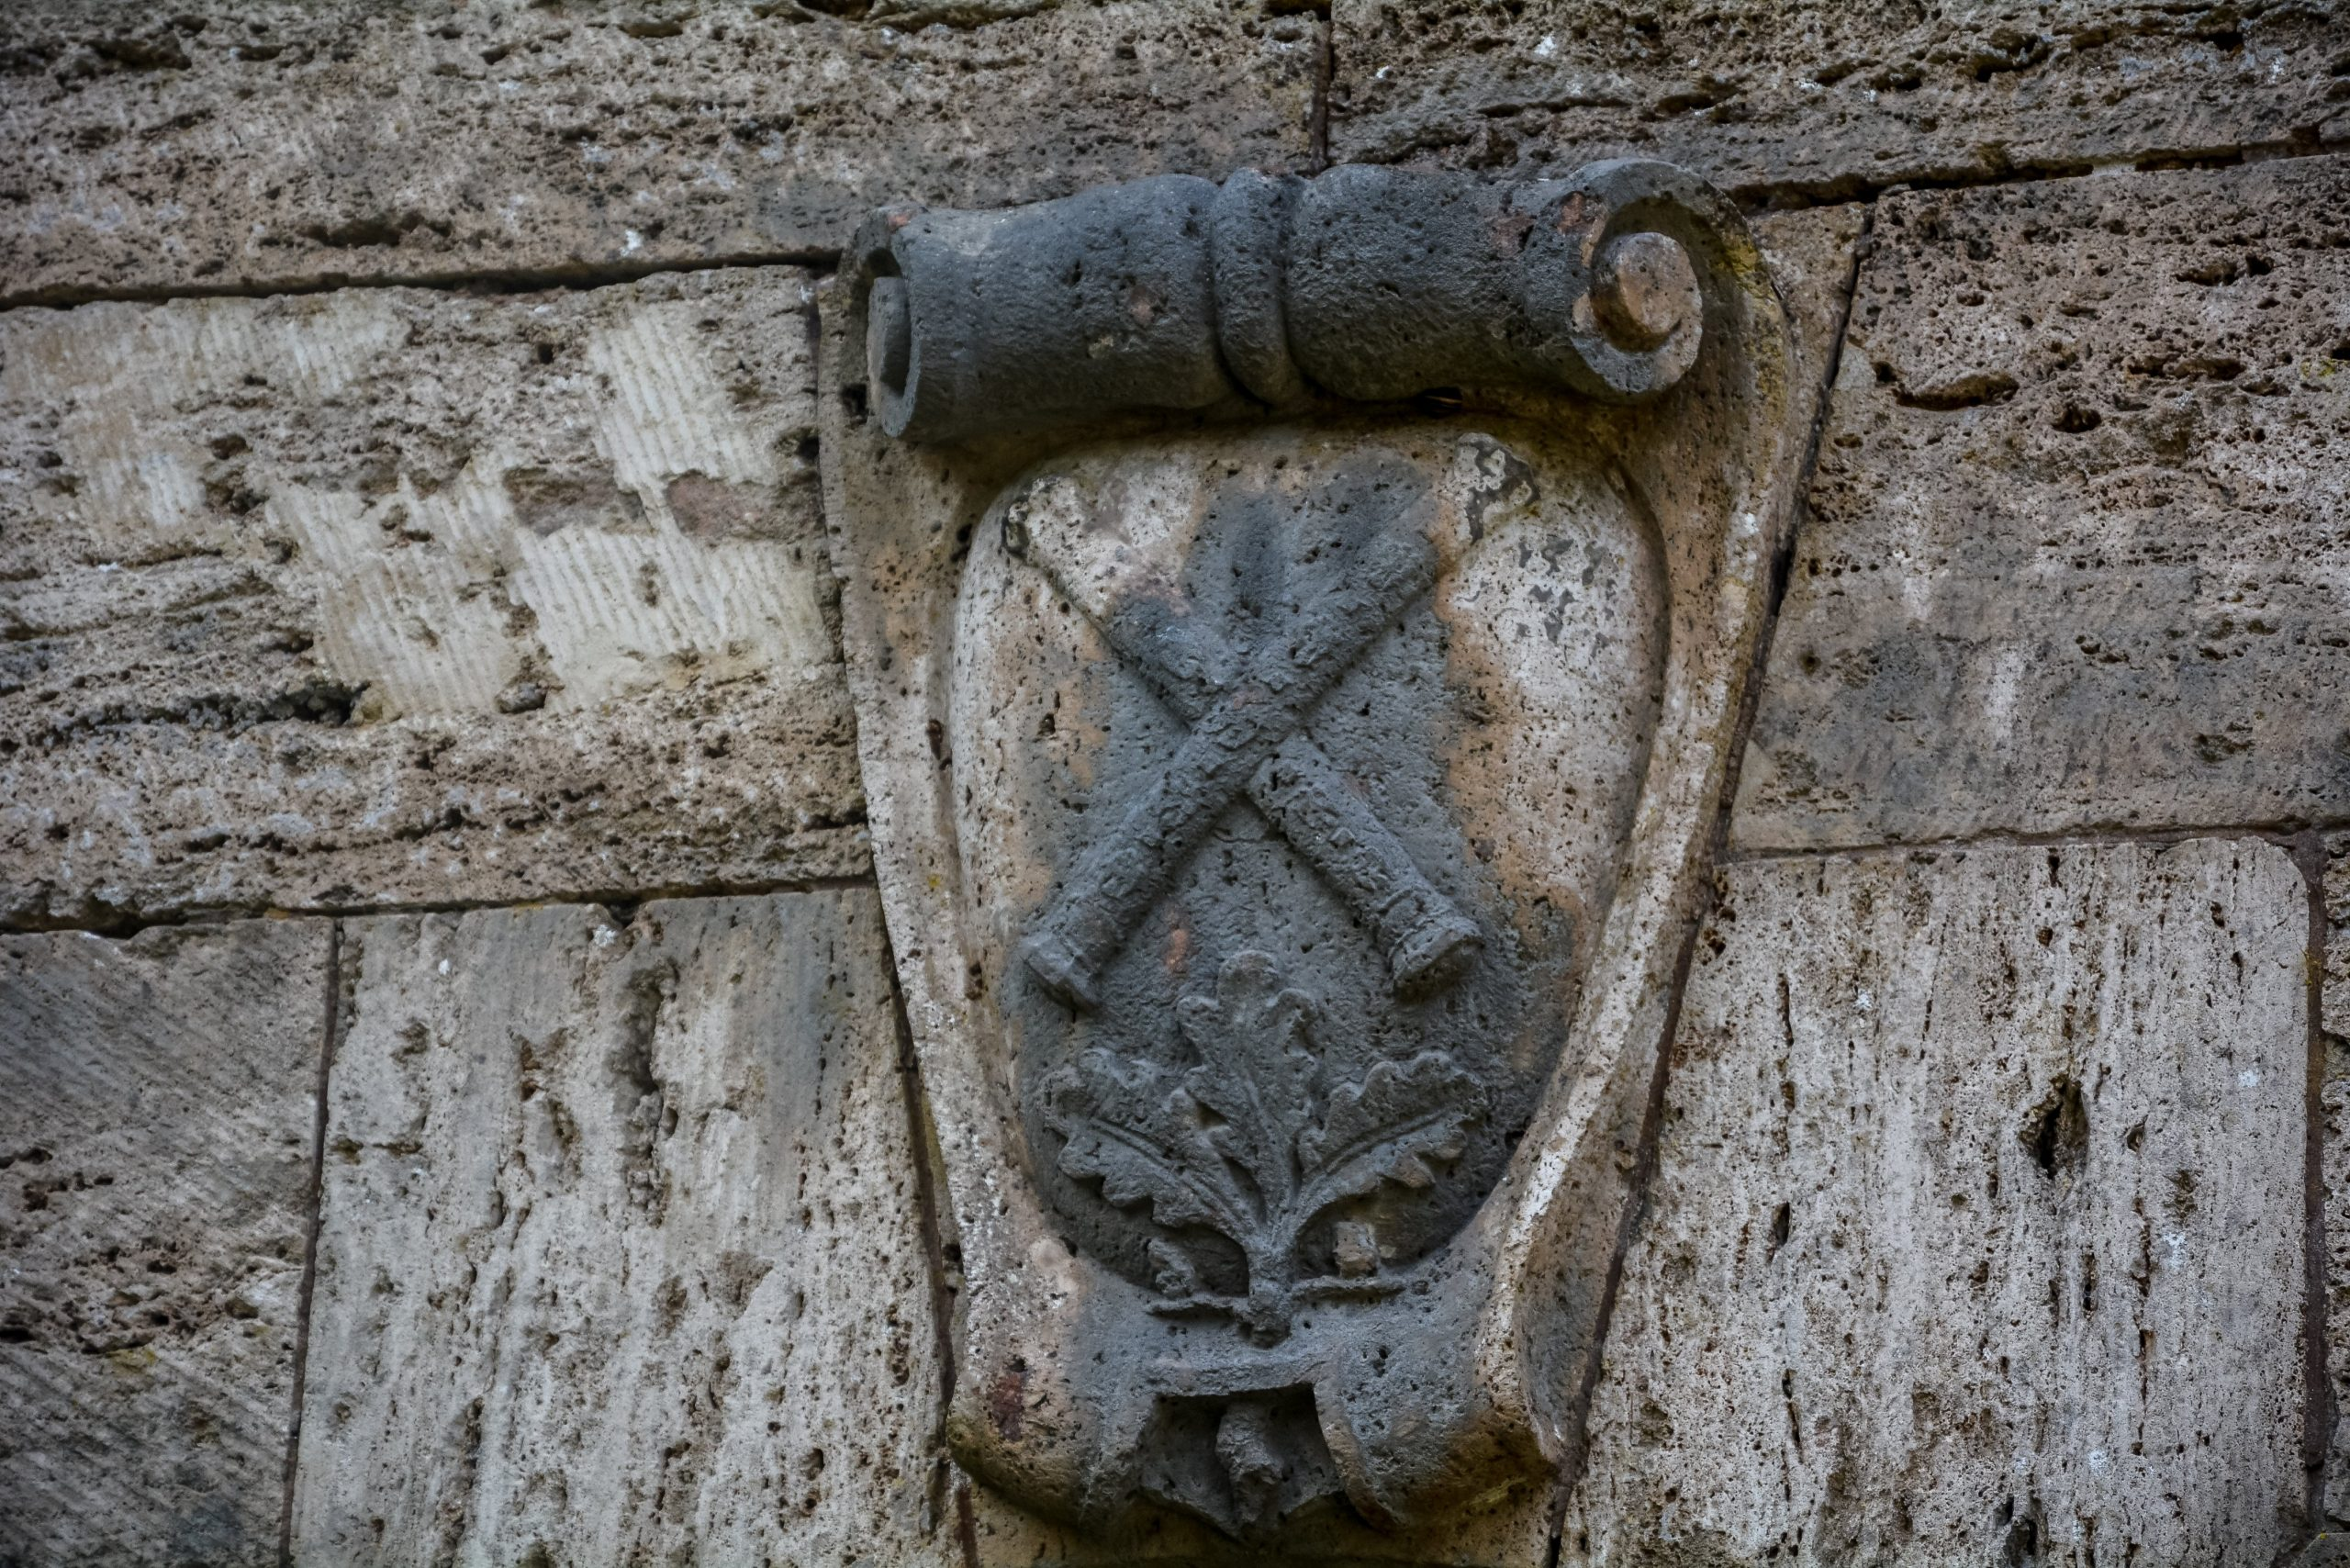 herrmann goering Marshall batons carinhall guardhouse schorfheide germany